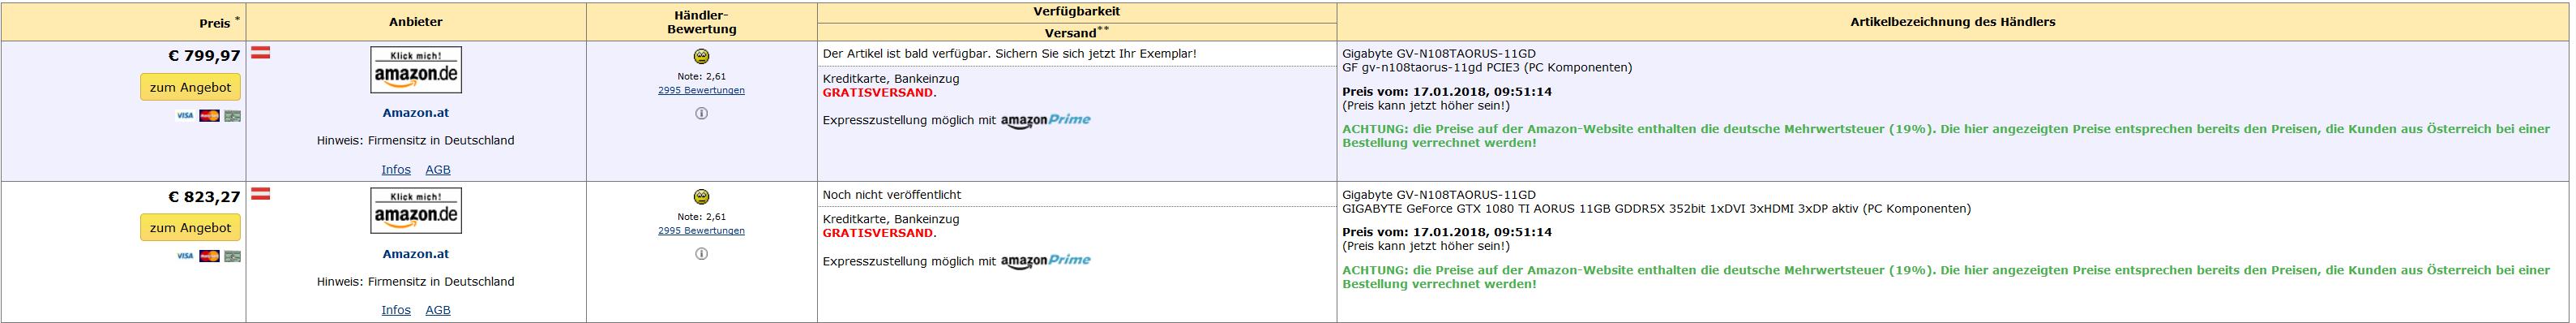 Gigabyte Aorus GTX 1080 11 Gbps -1080ti verschiede Versionen